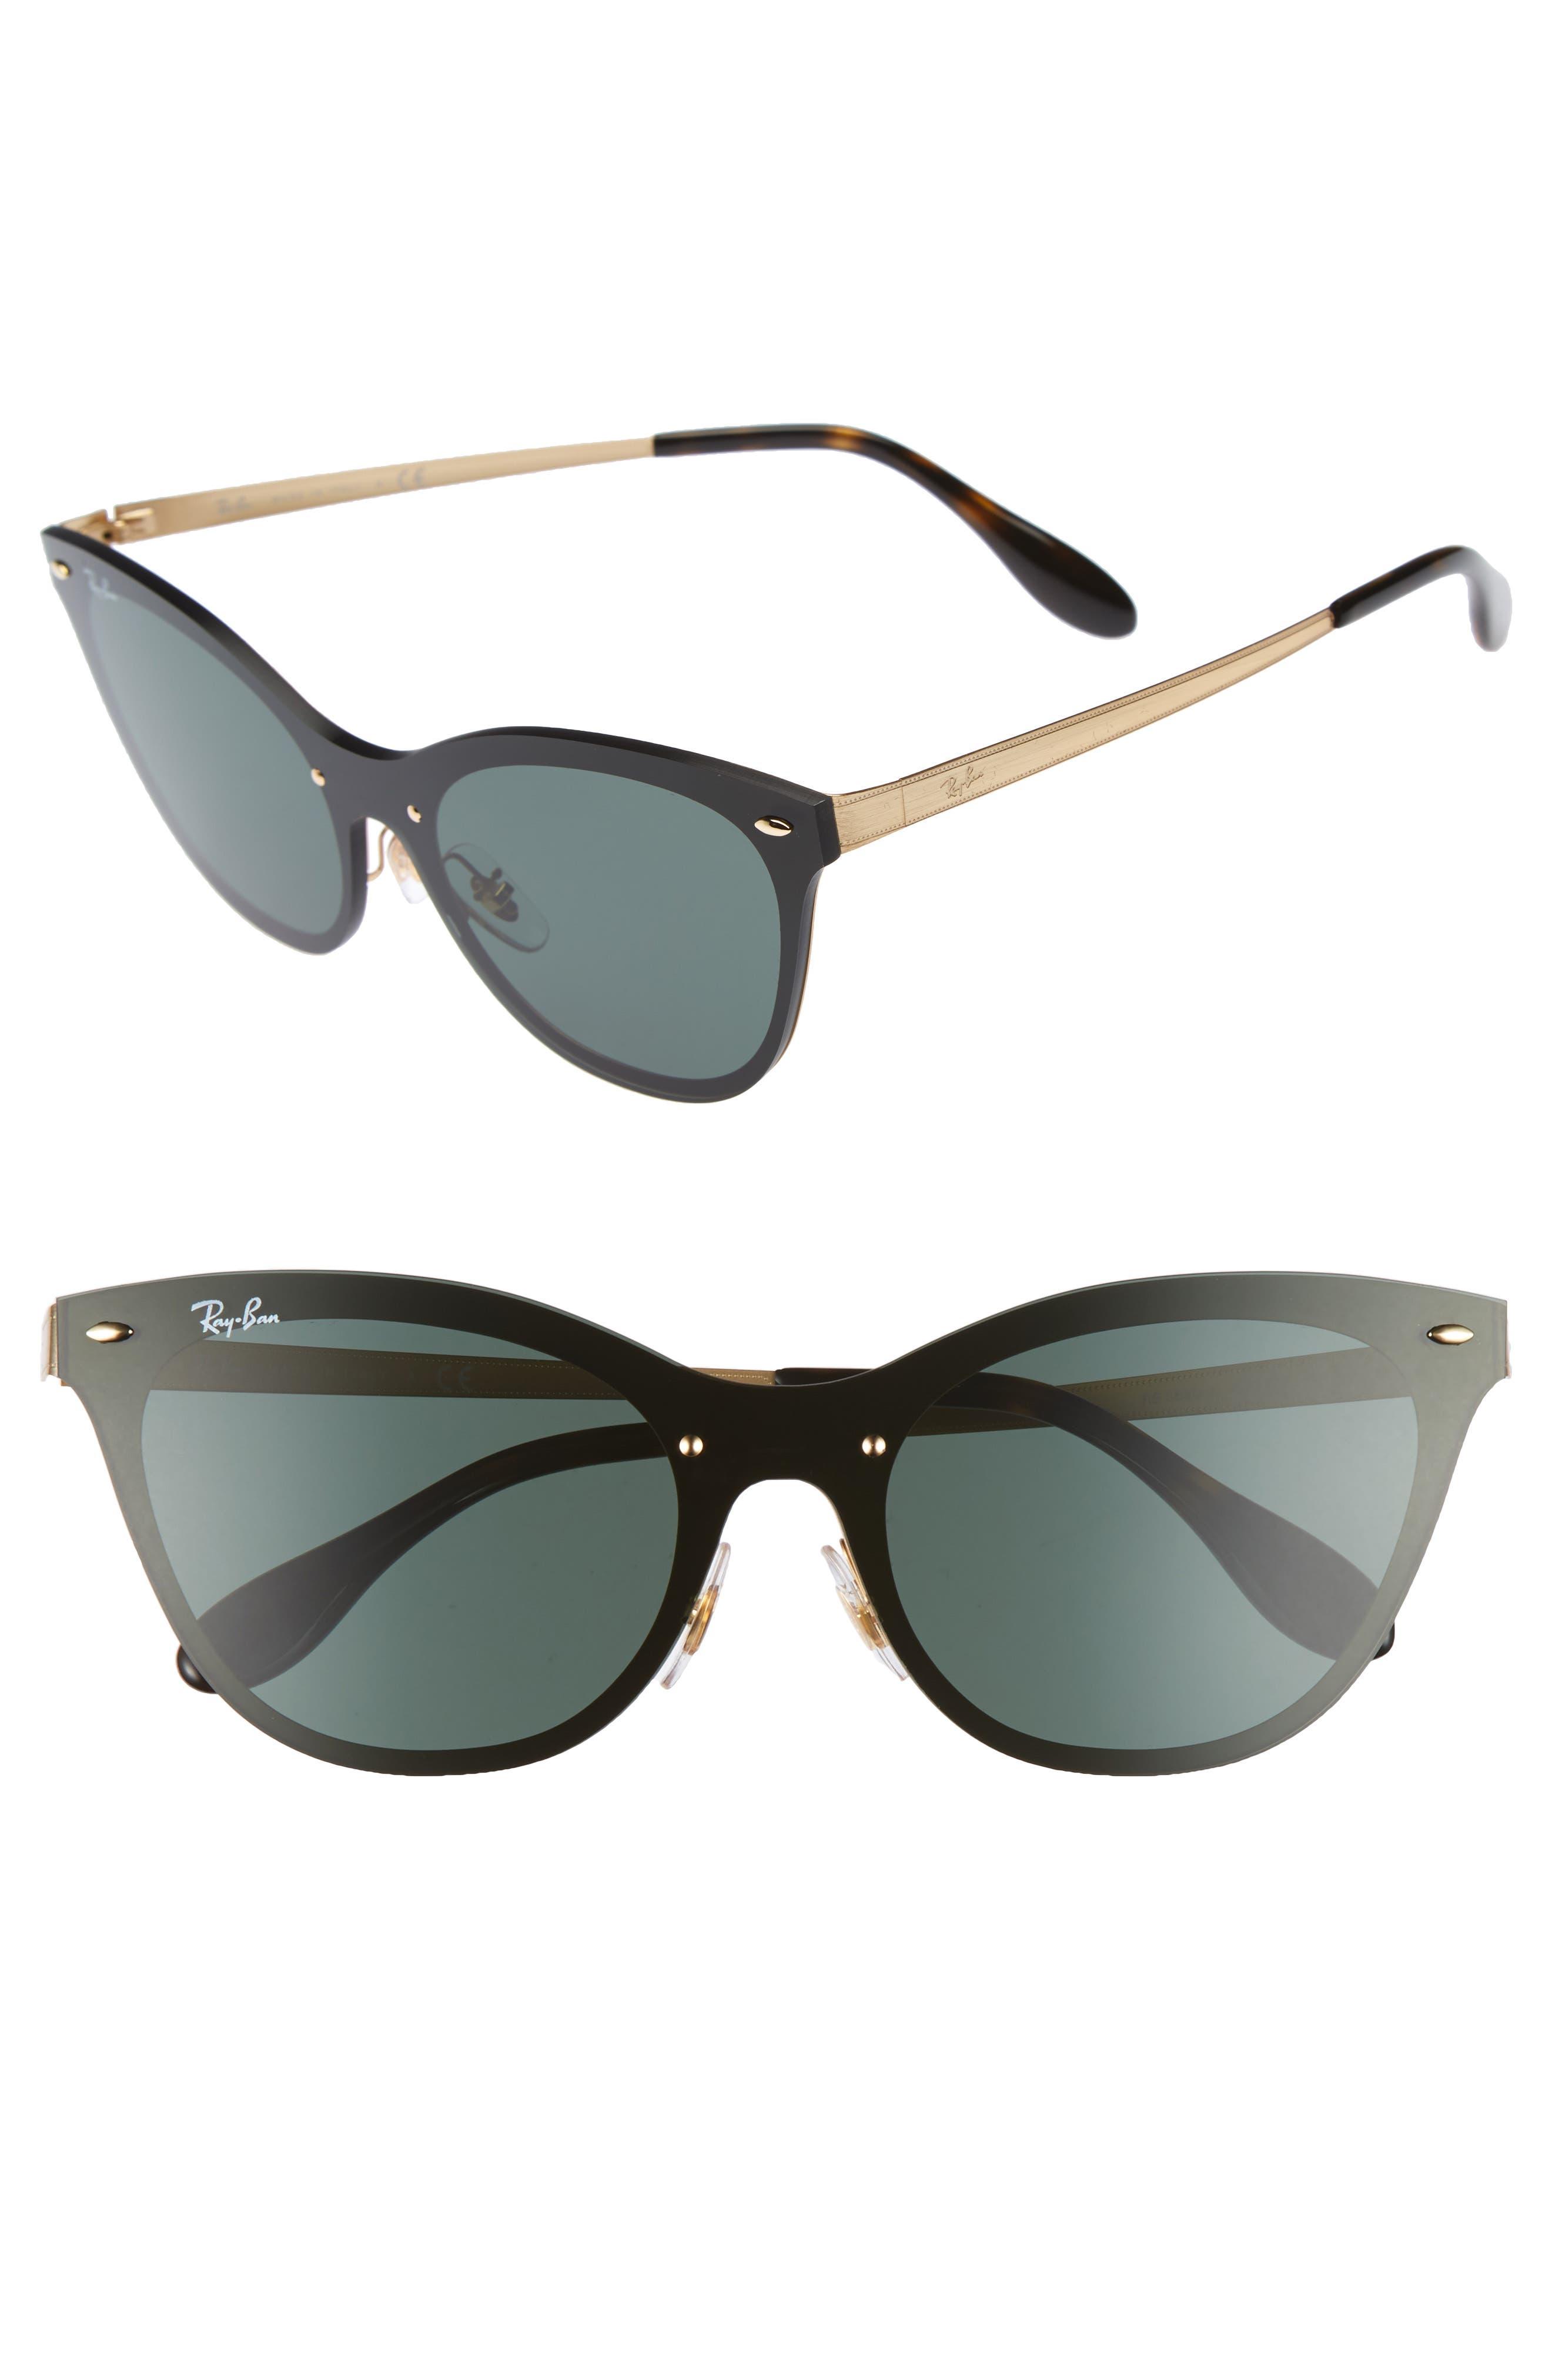 Ray-Ban Blaze 58mm Mirrored Cat Eye Sunglasses